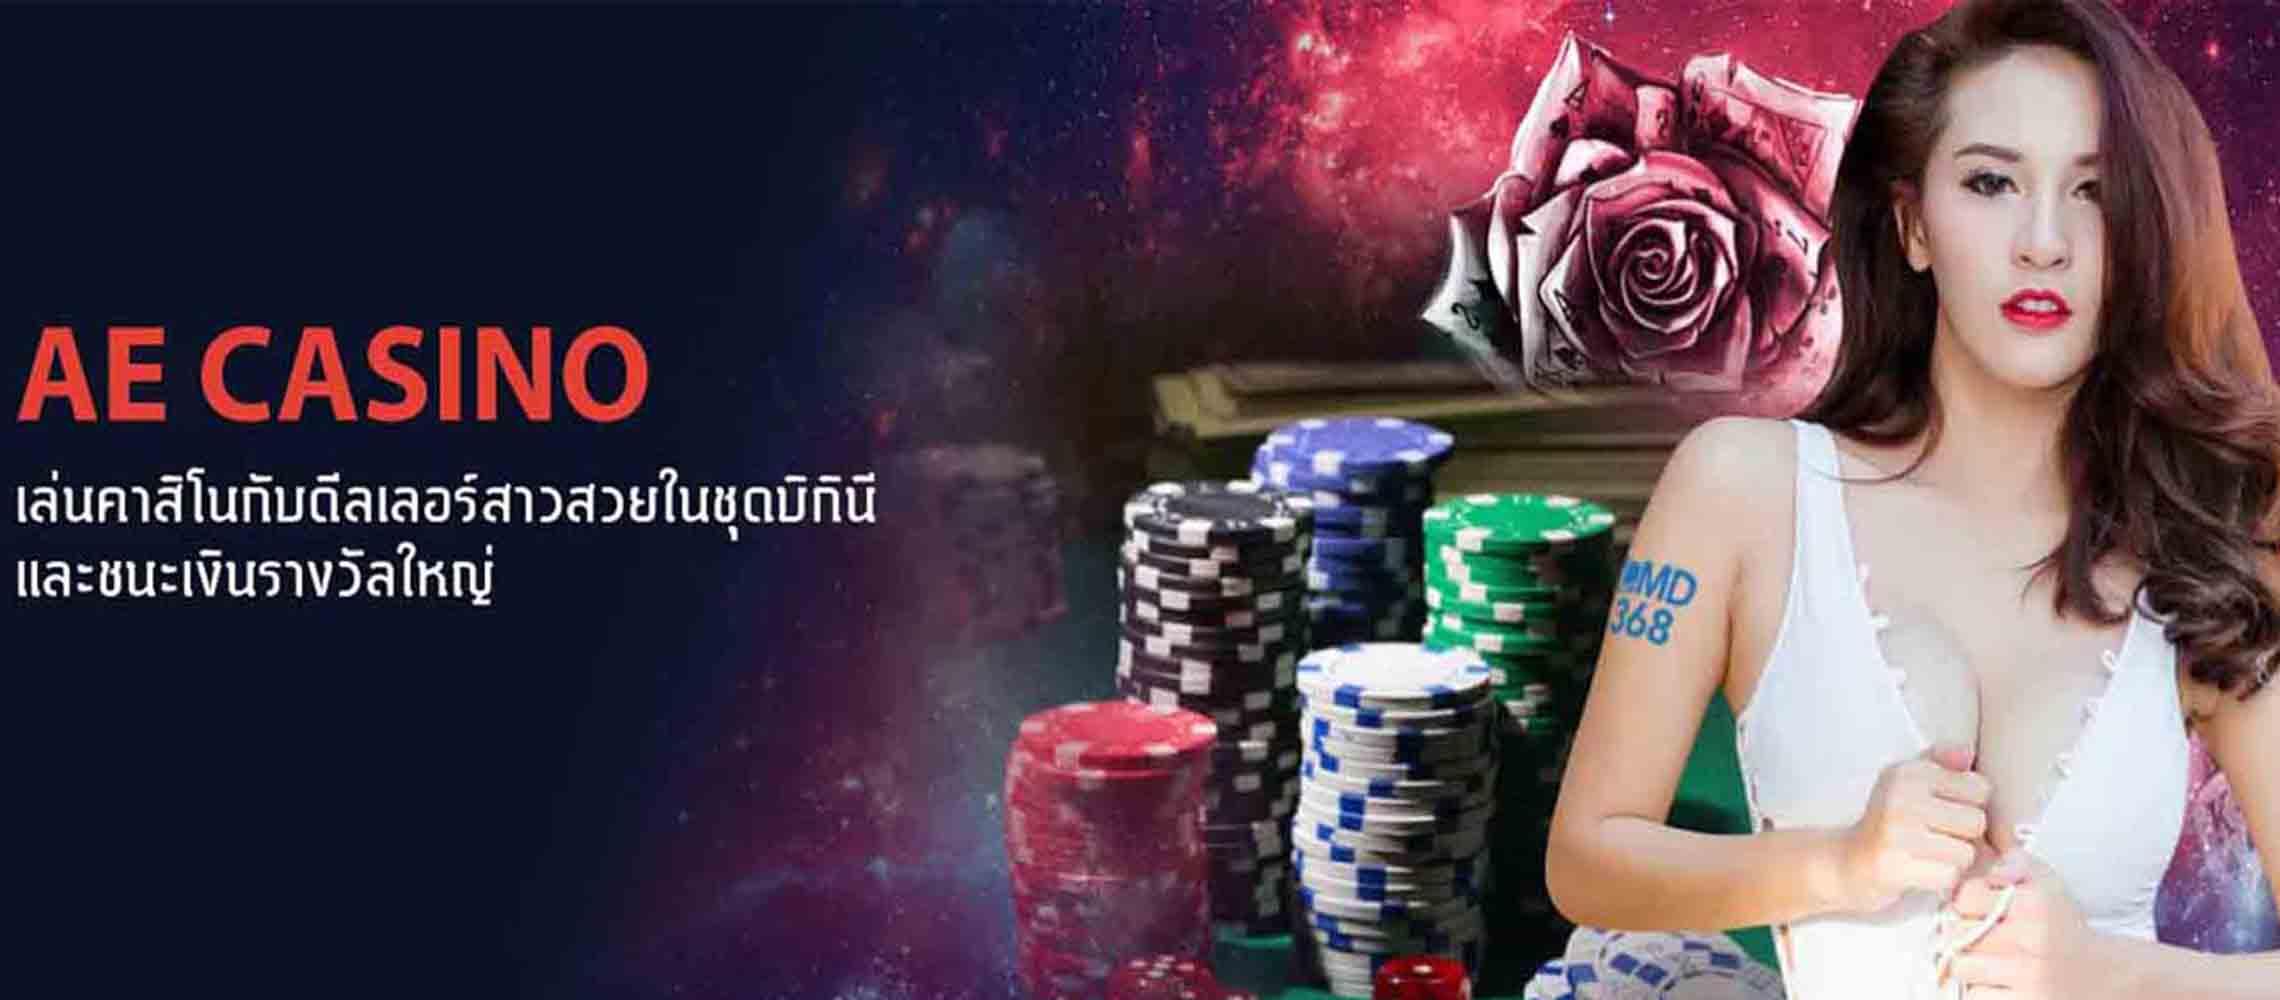 casino online AE